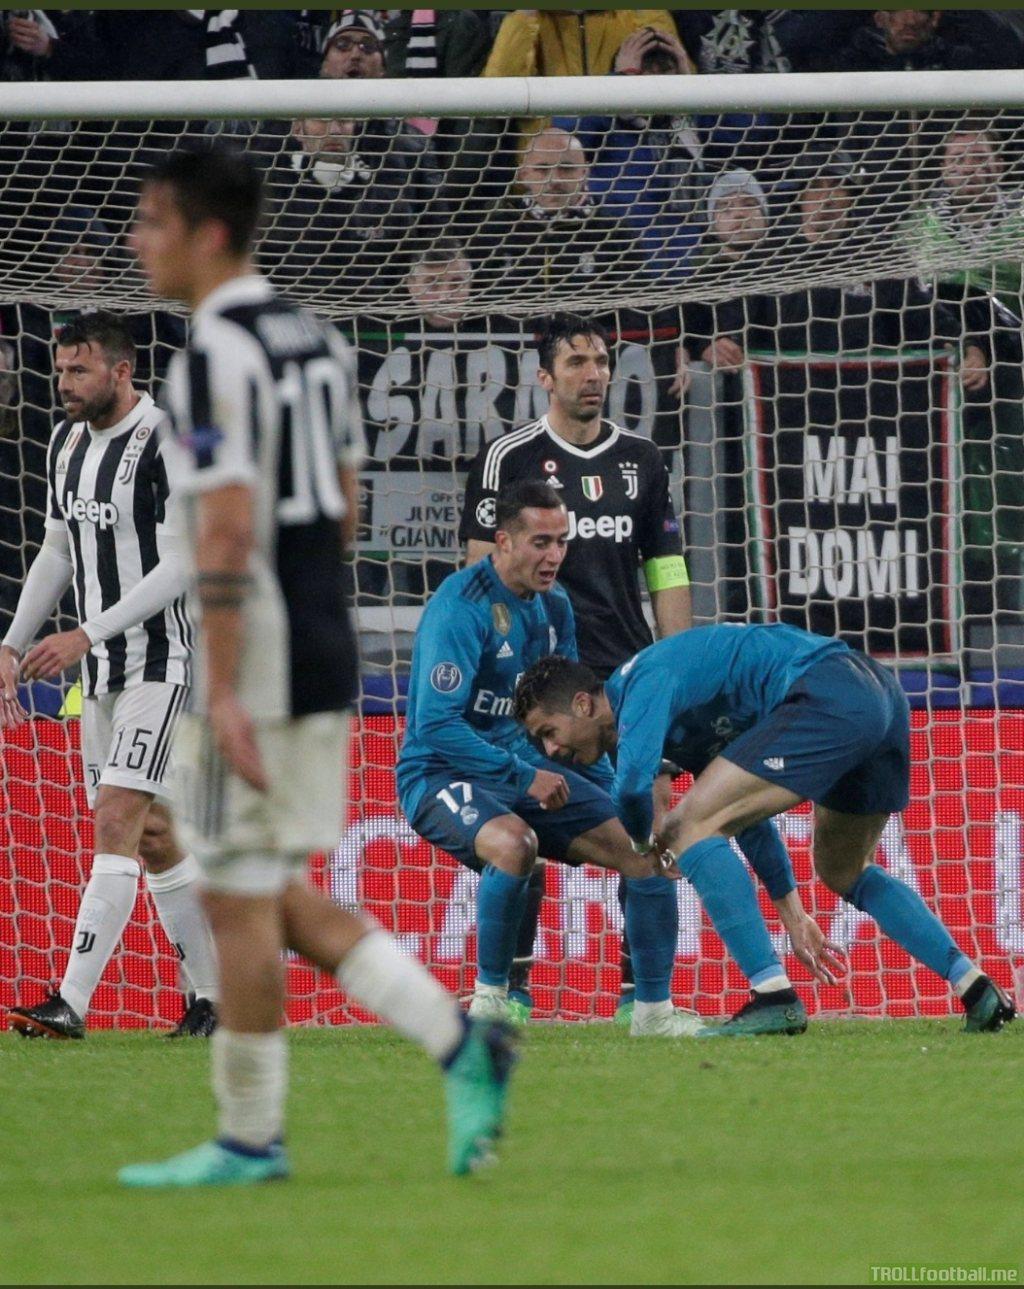 Buffon's face says it all